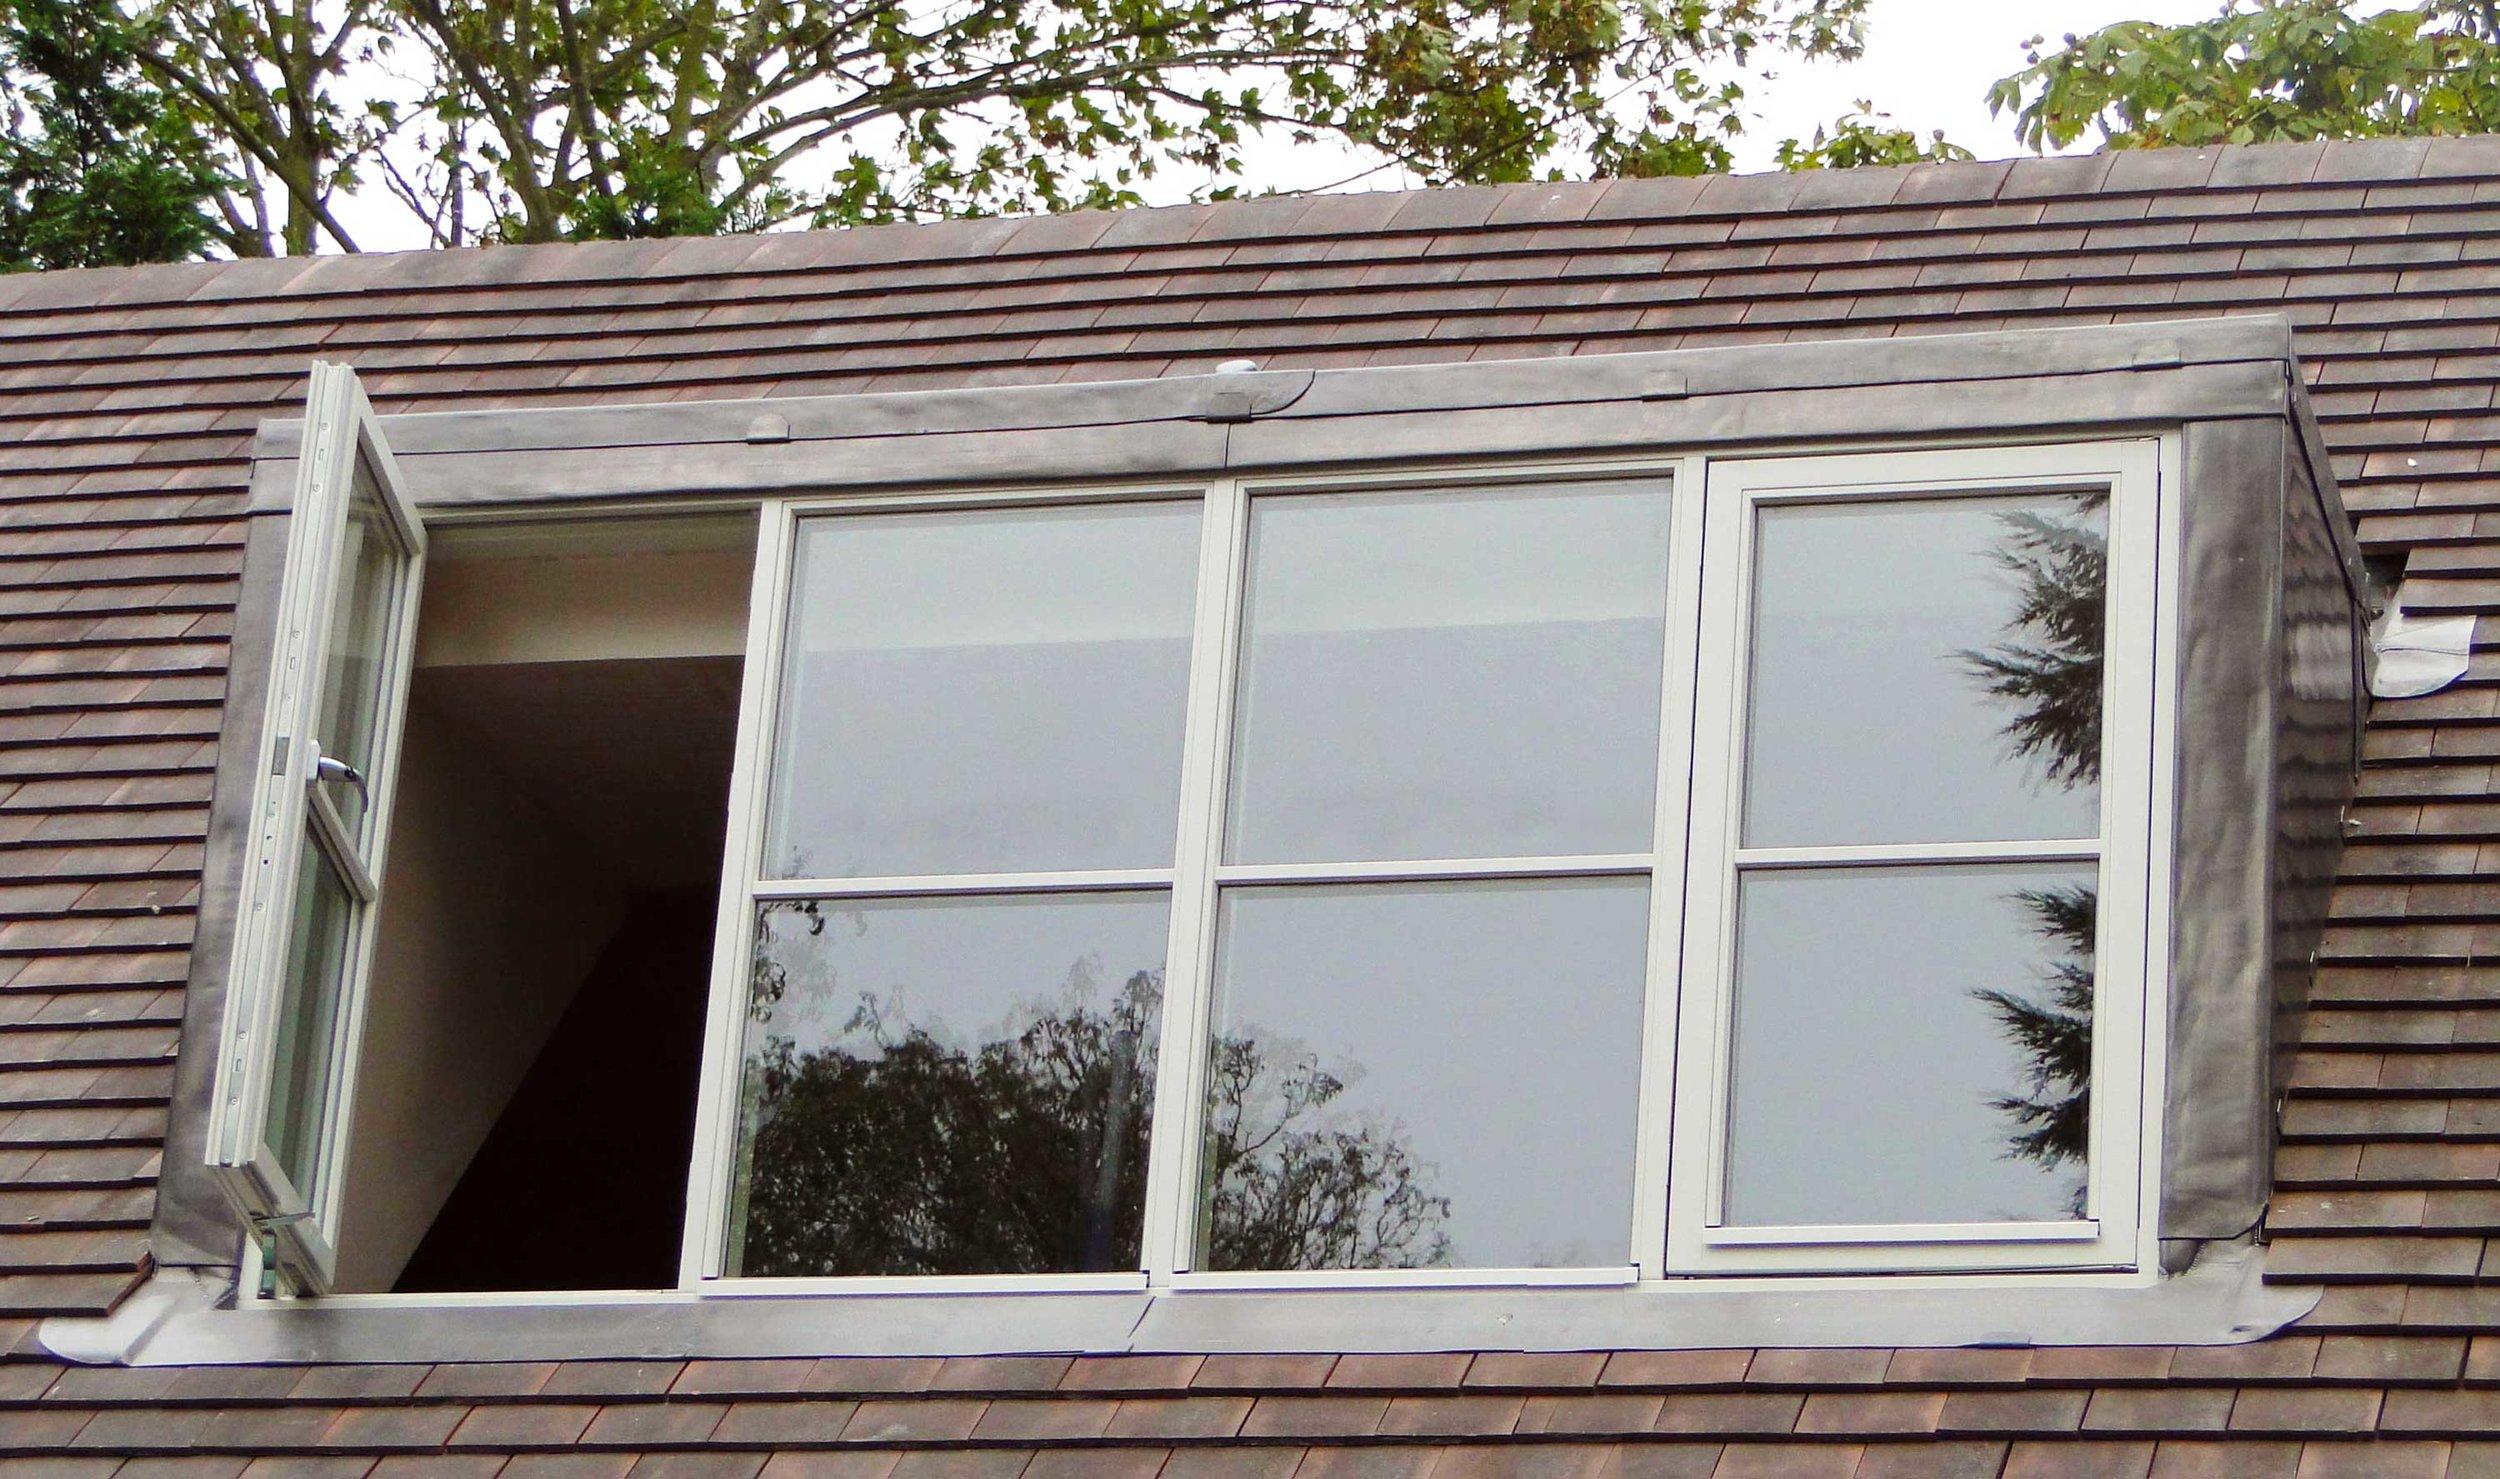 New build 650sqm detached house in Bedlar's Green in Great Hallingbury.